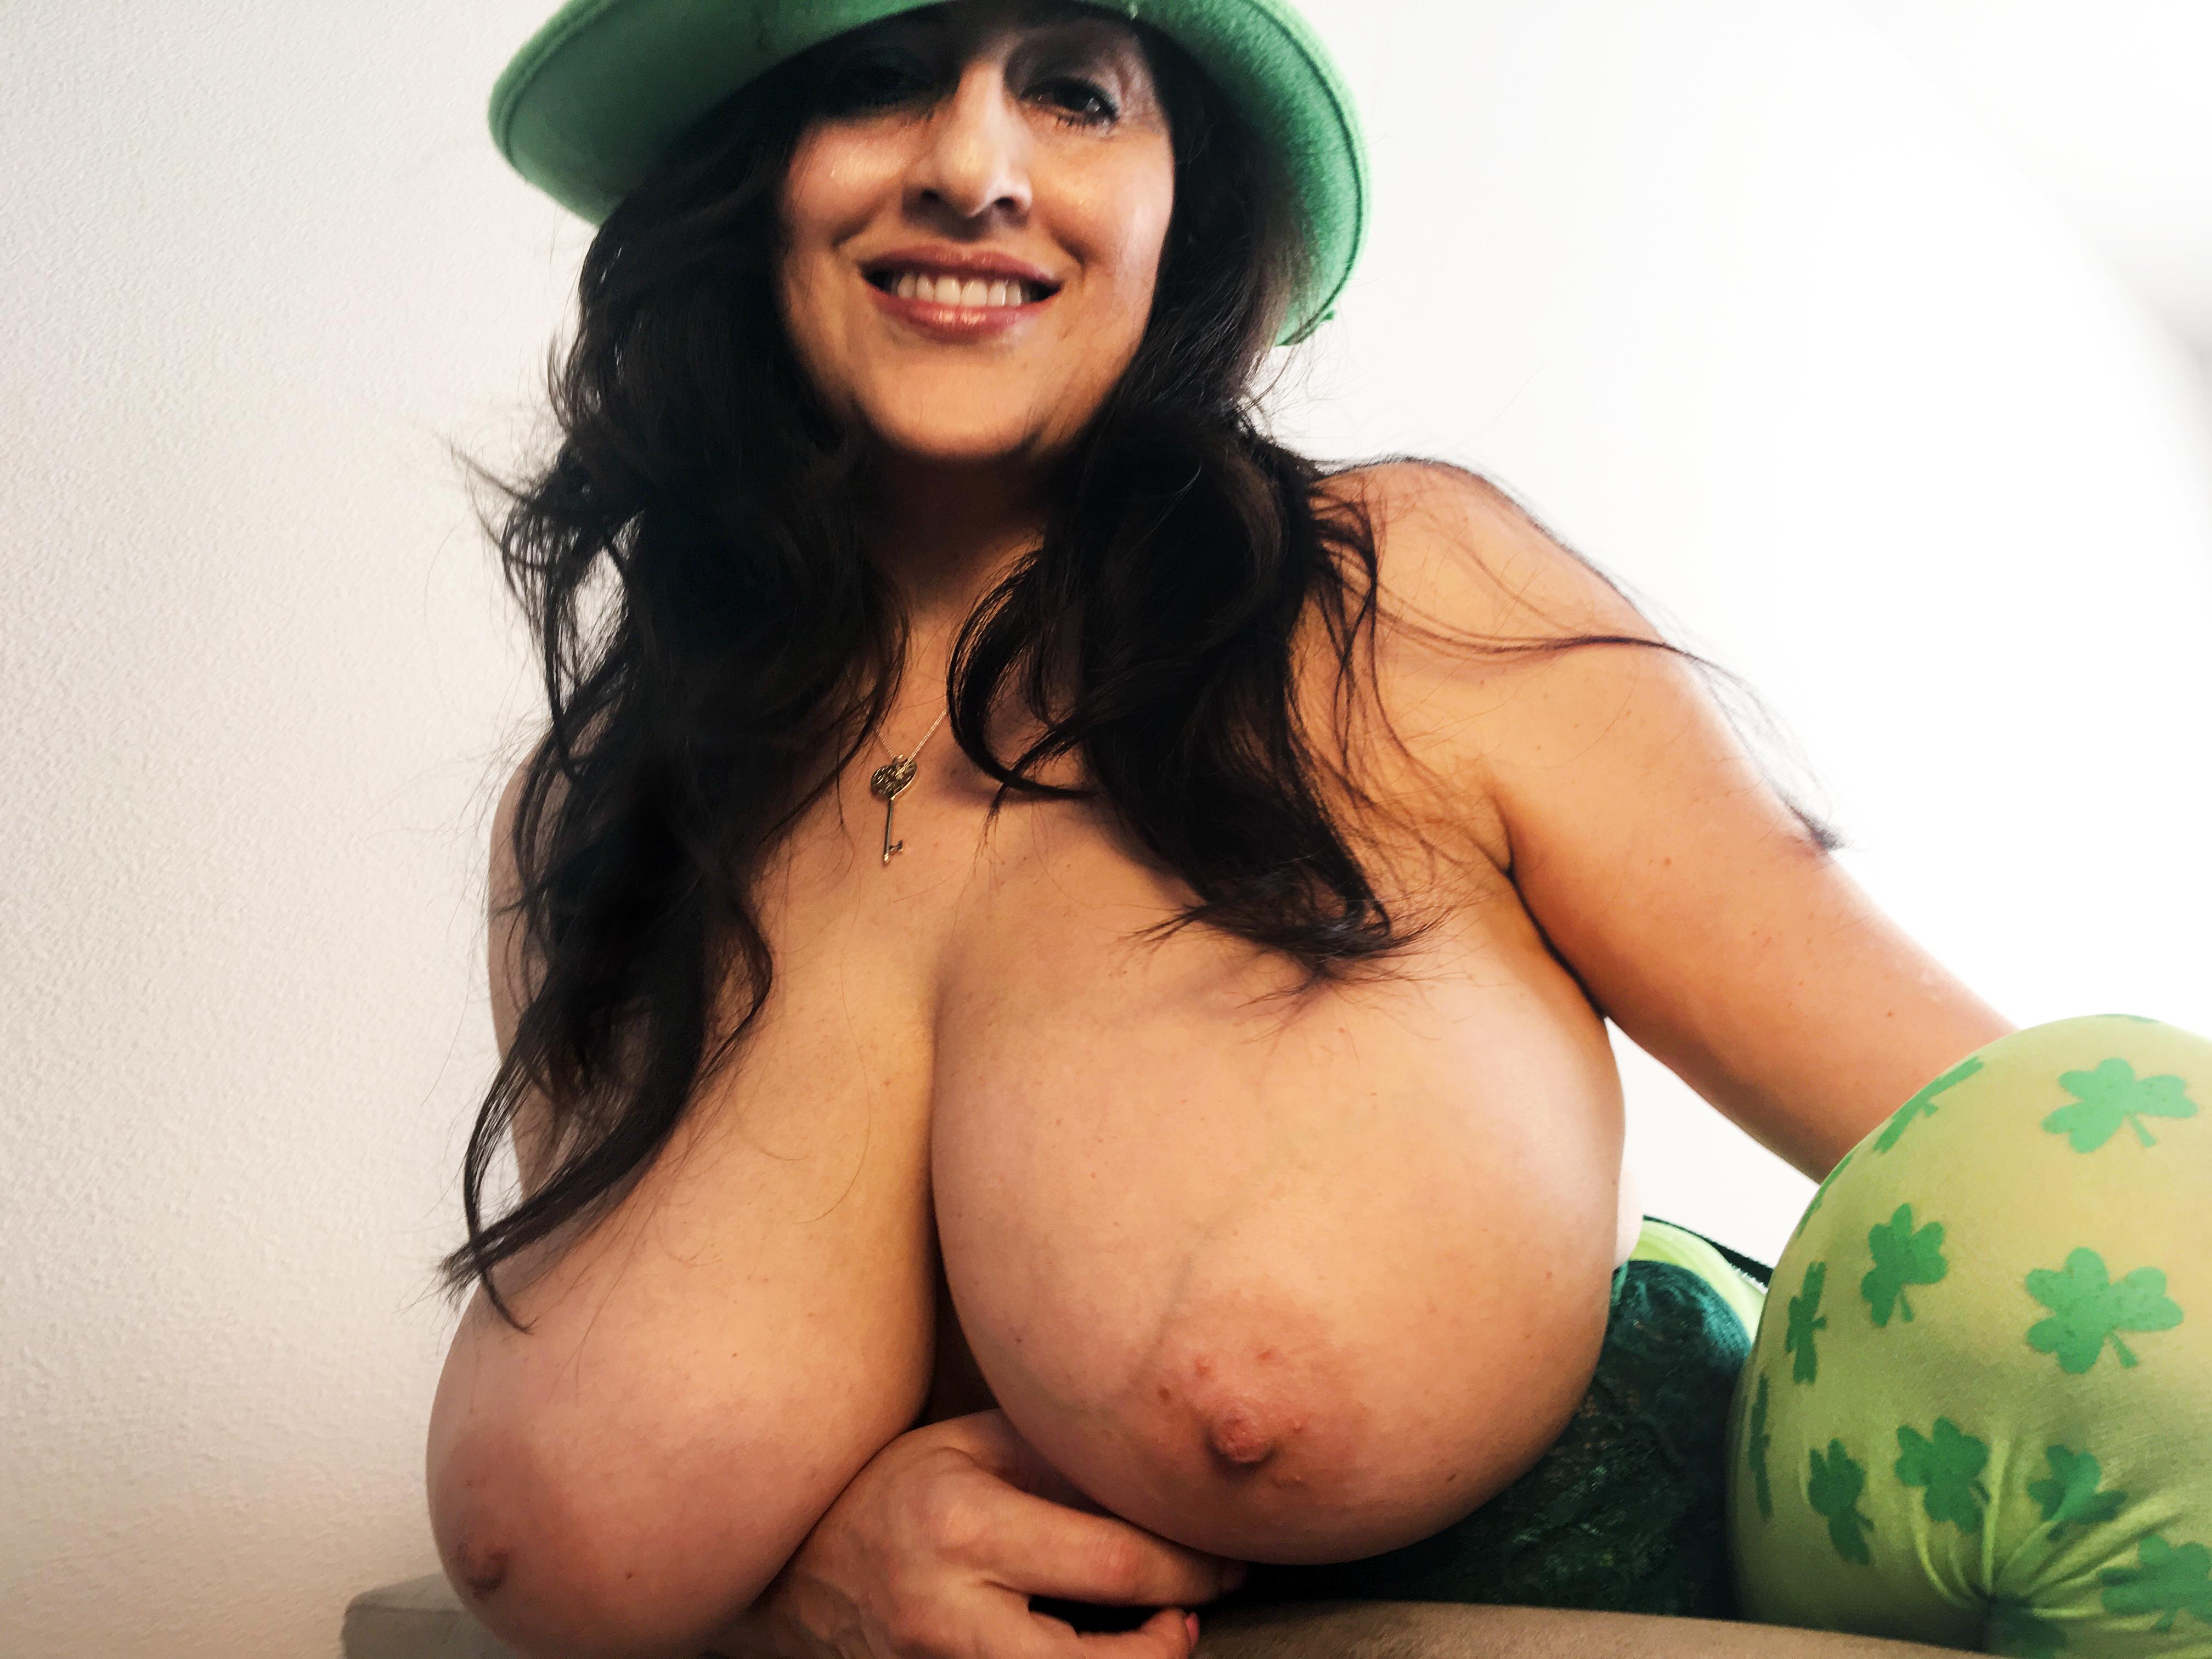 big boob celebration